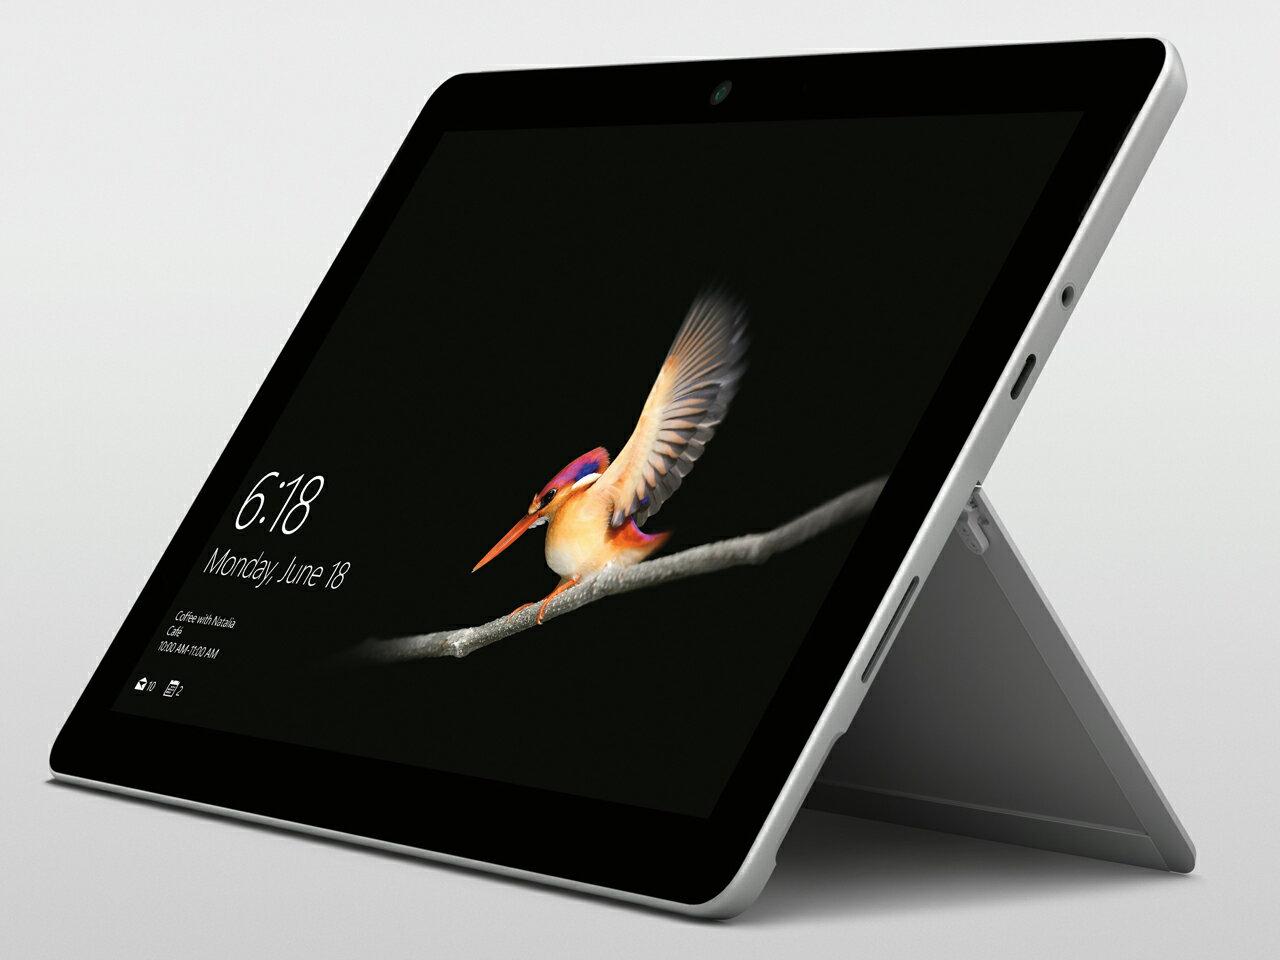 Surface Go MHN-00014  マイクロソフト(Microsoft) 10インチ /